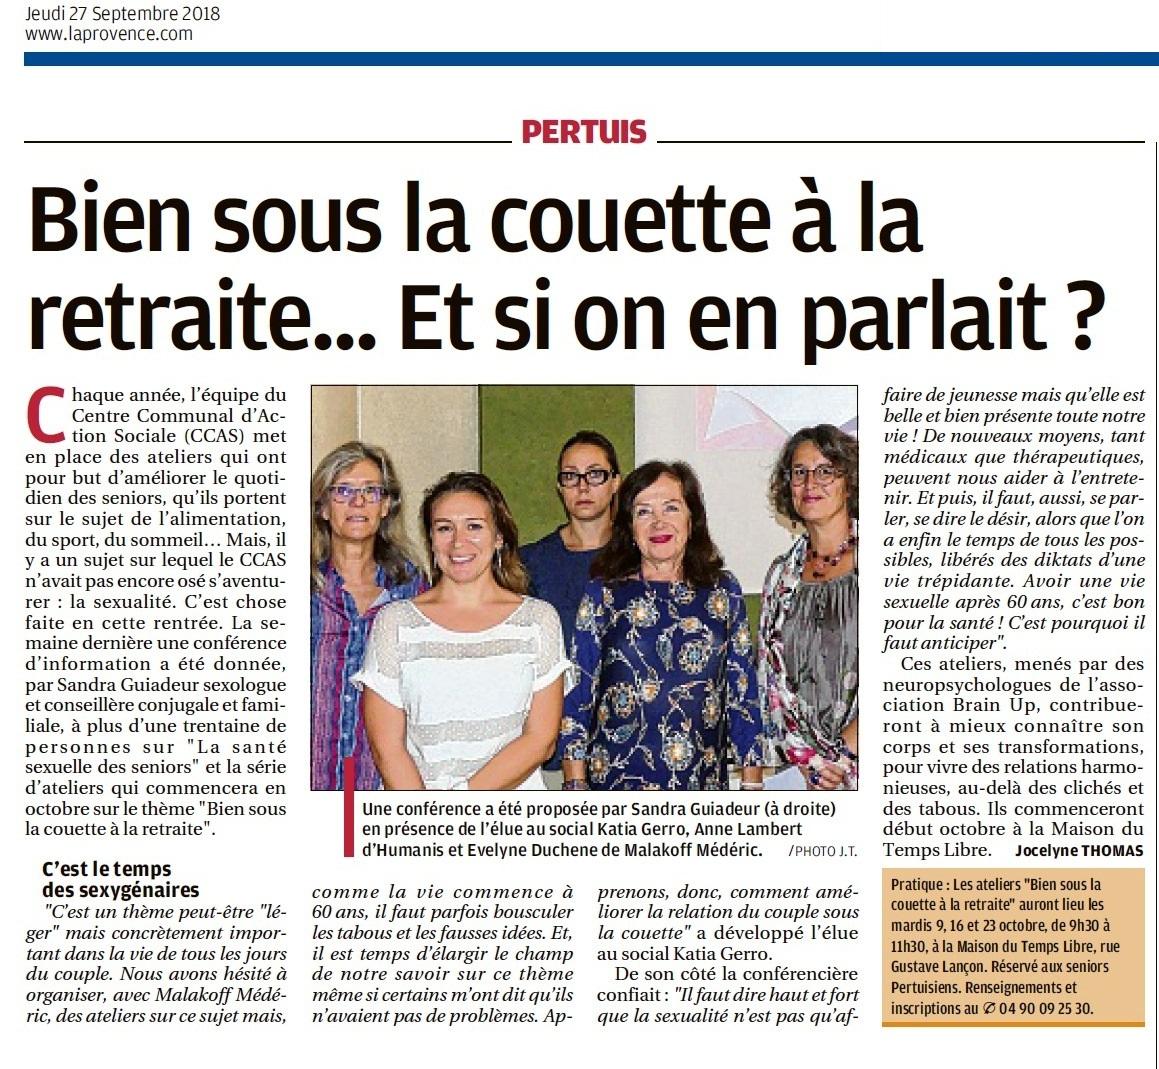 Article Pertuis - La Provence.com